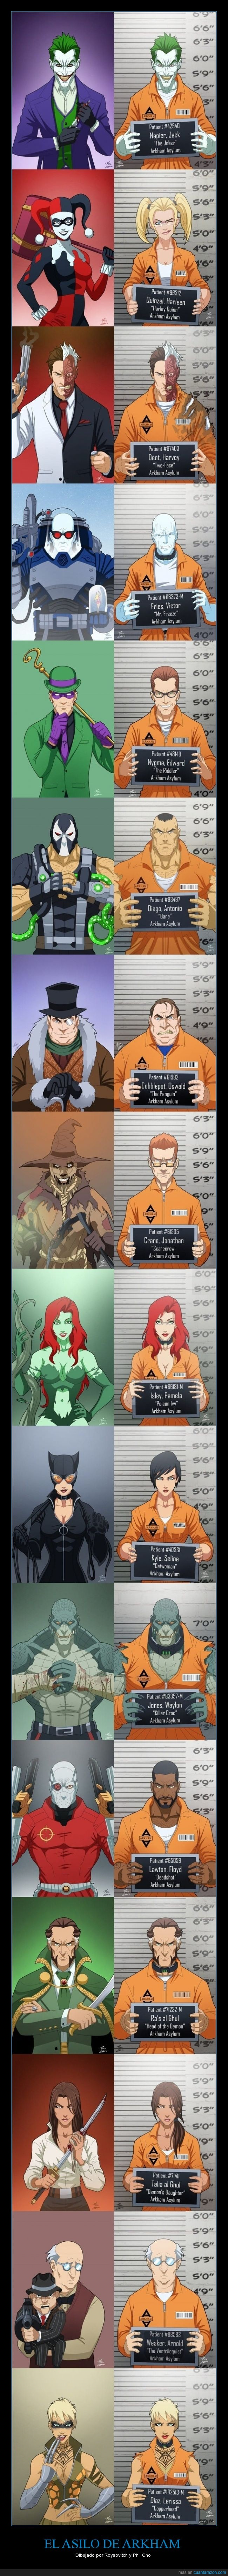 arkham asylum,batman,guason,harley queen,joker,verdaderos nombres,villanos